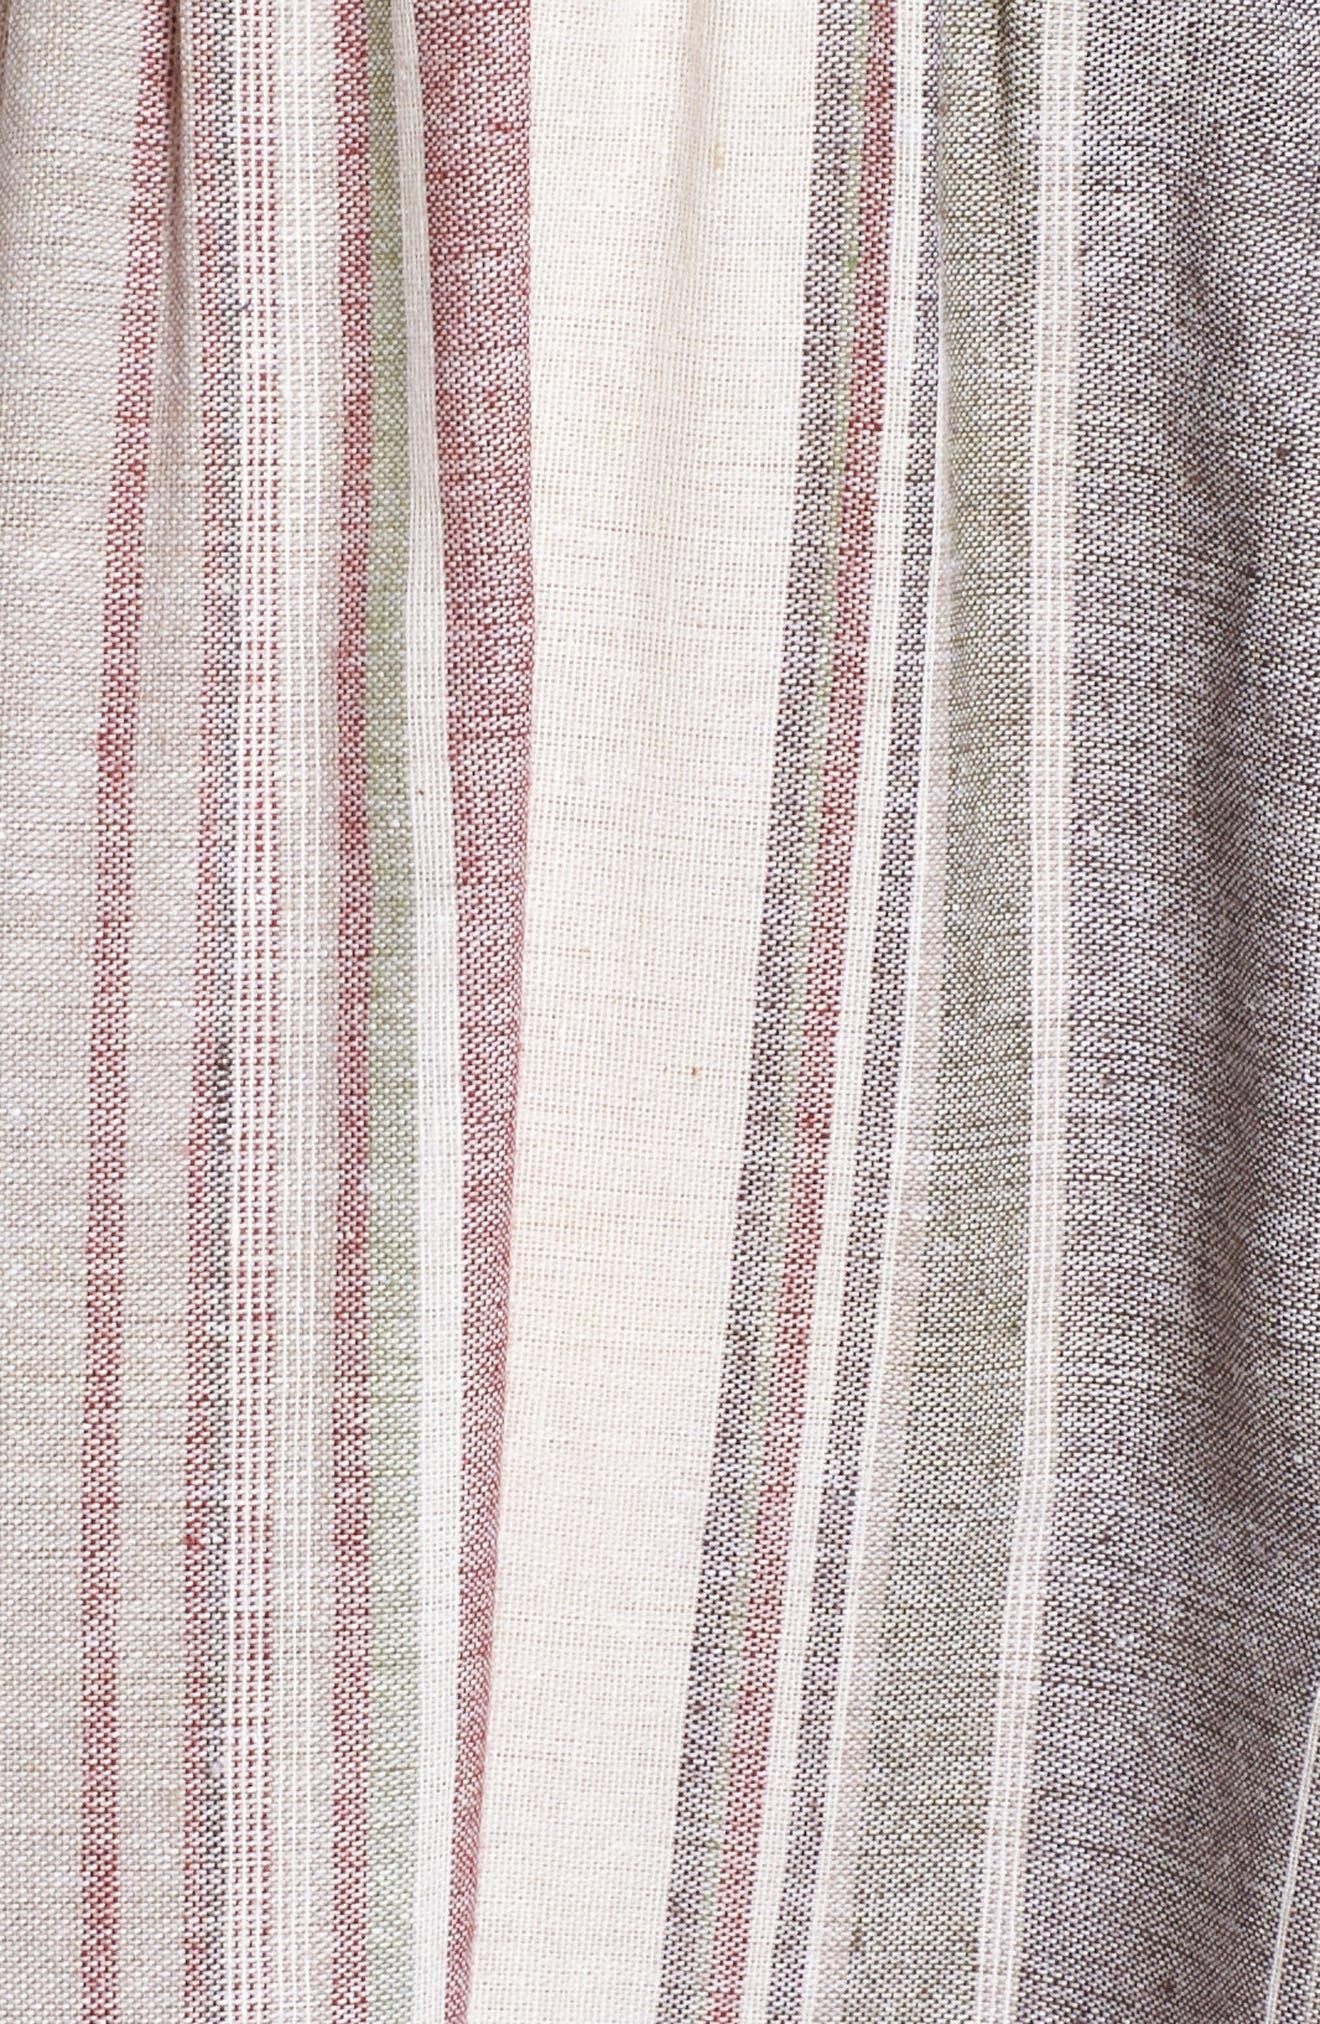 Stripe Maxi Dress,                             Alternate thumbnail 6, color,                             Cream